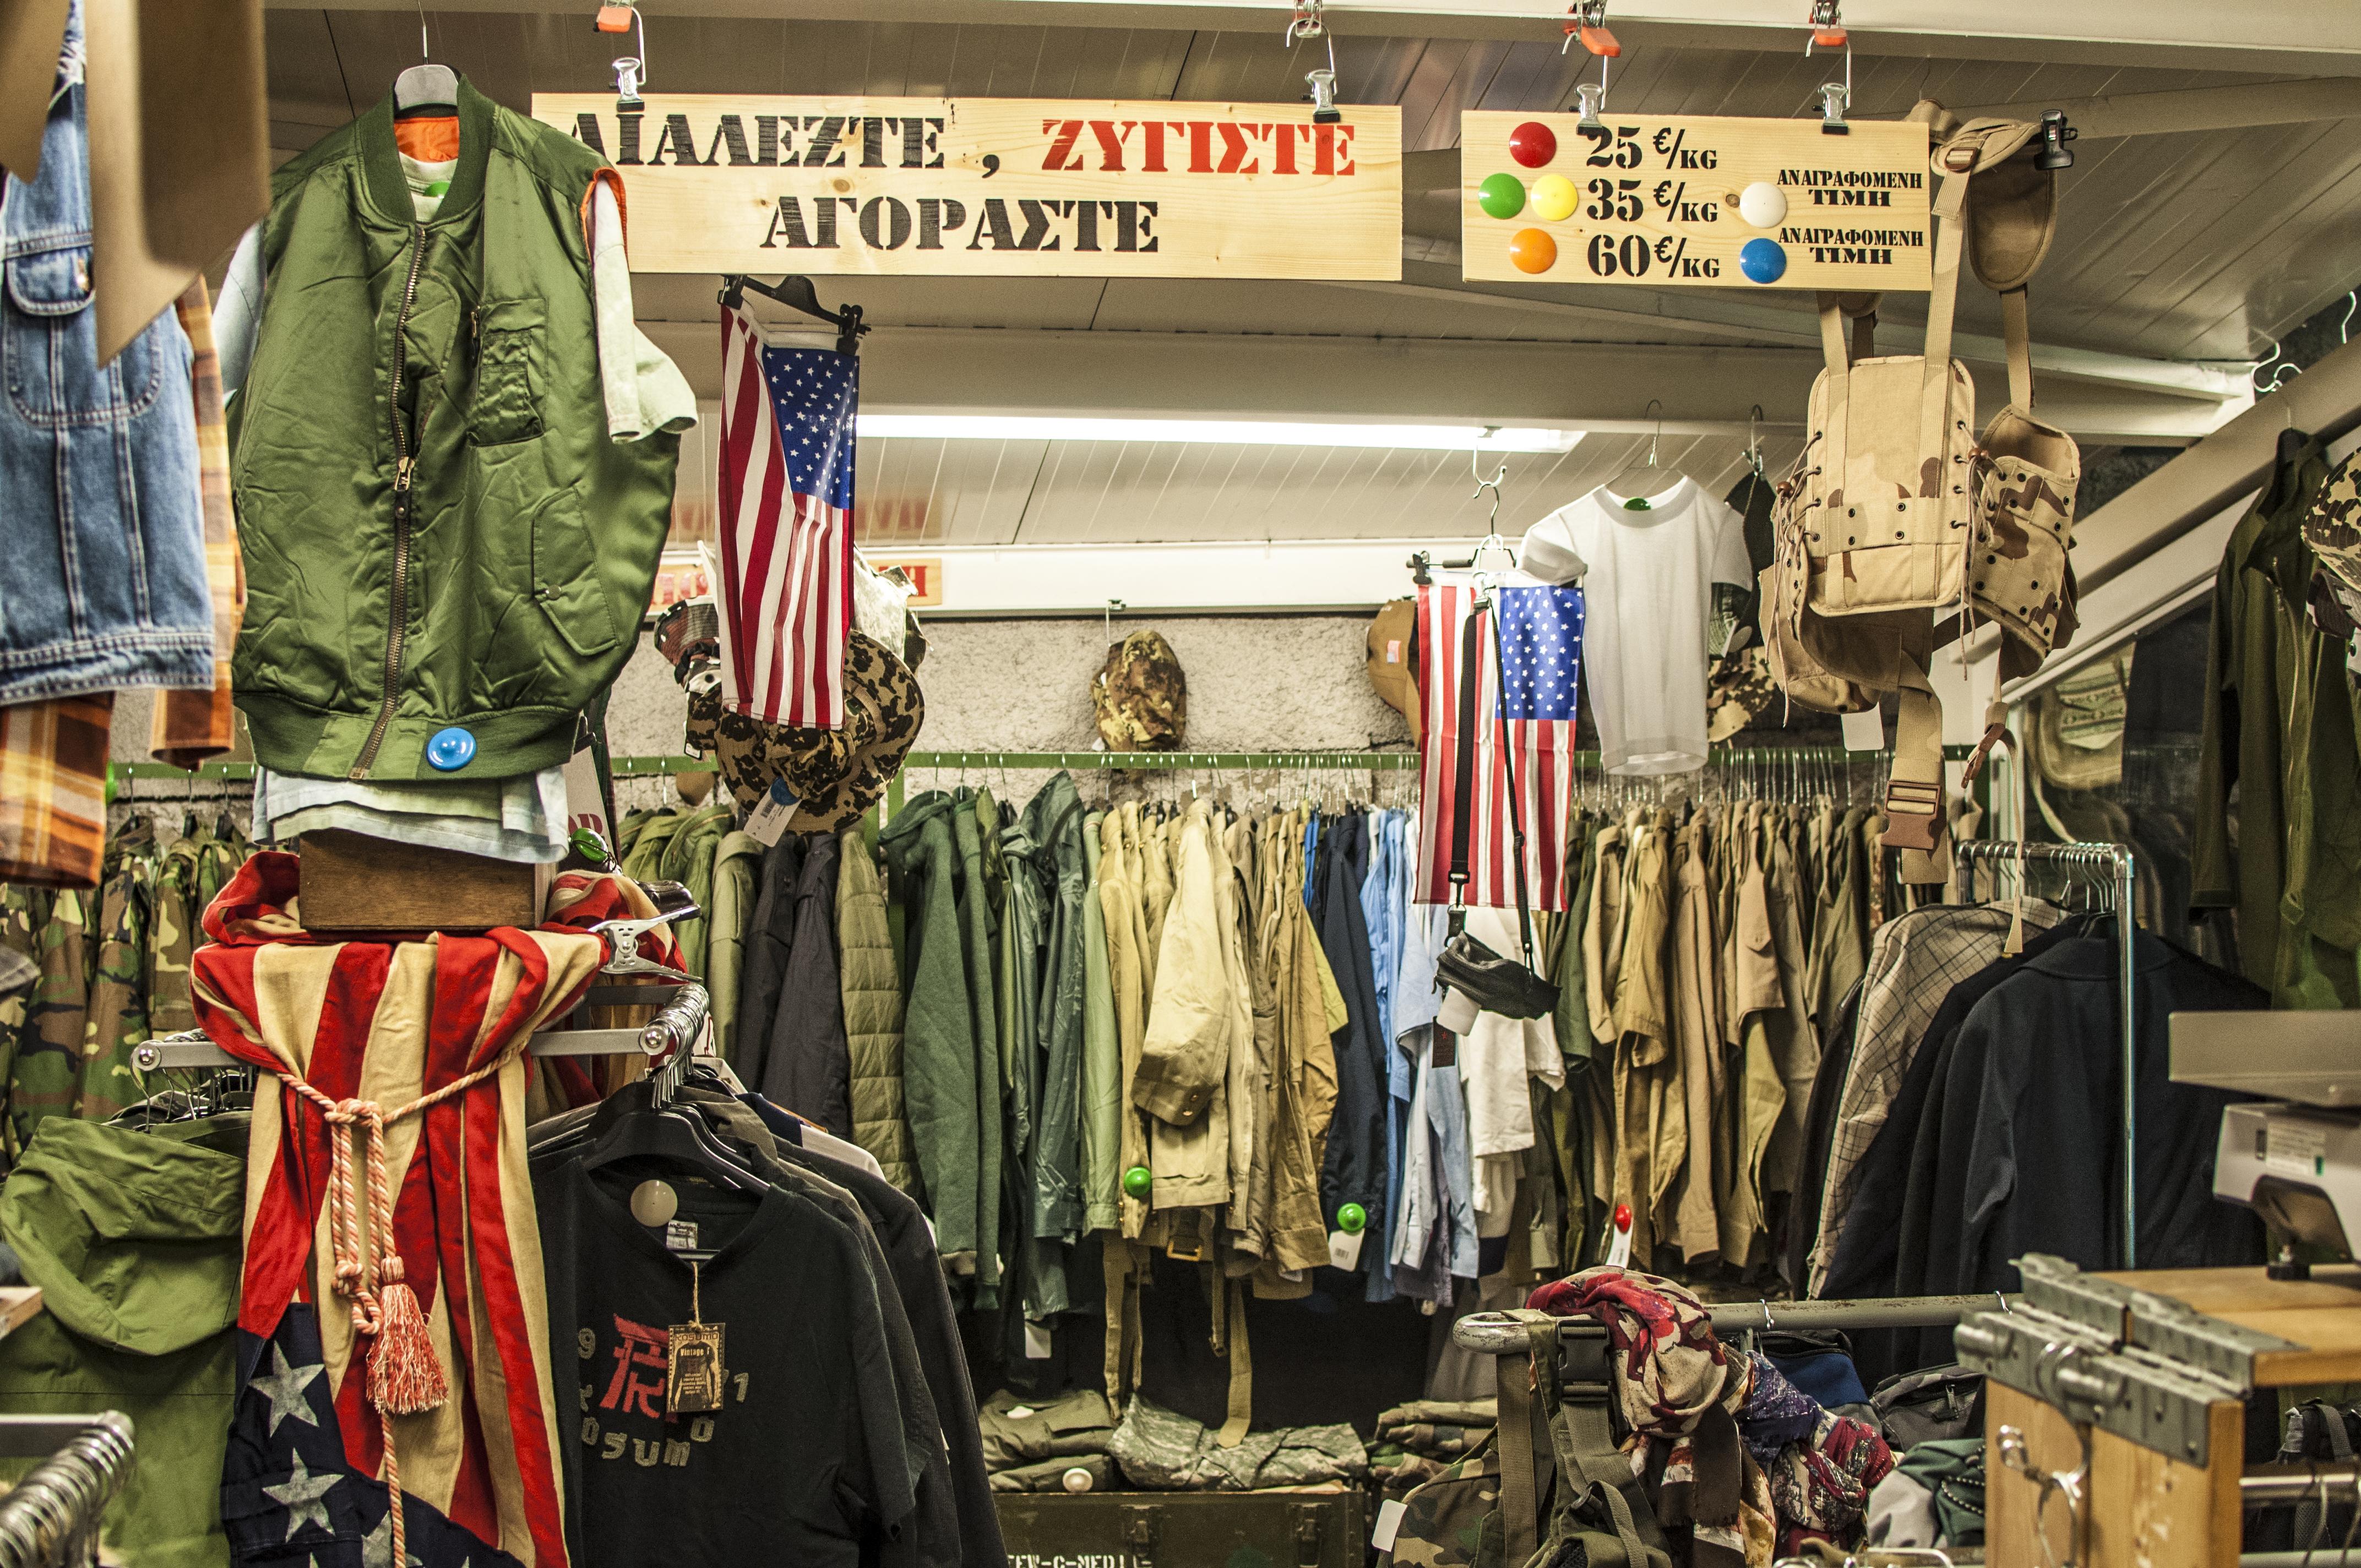 ac536b0ec1dc Η κρίση έκανε… μόδα τα ρούχα με το κιλό και την ενοικίαση τσαντών | tovima